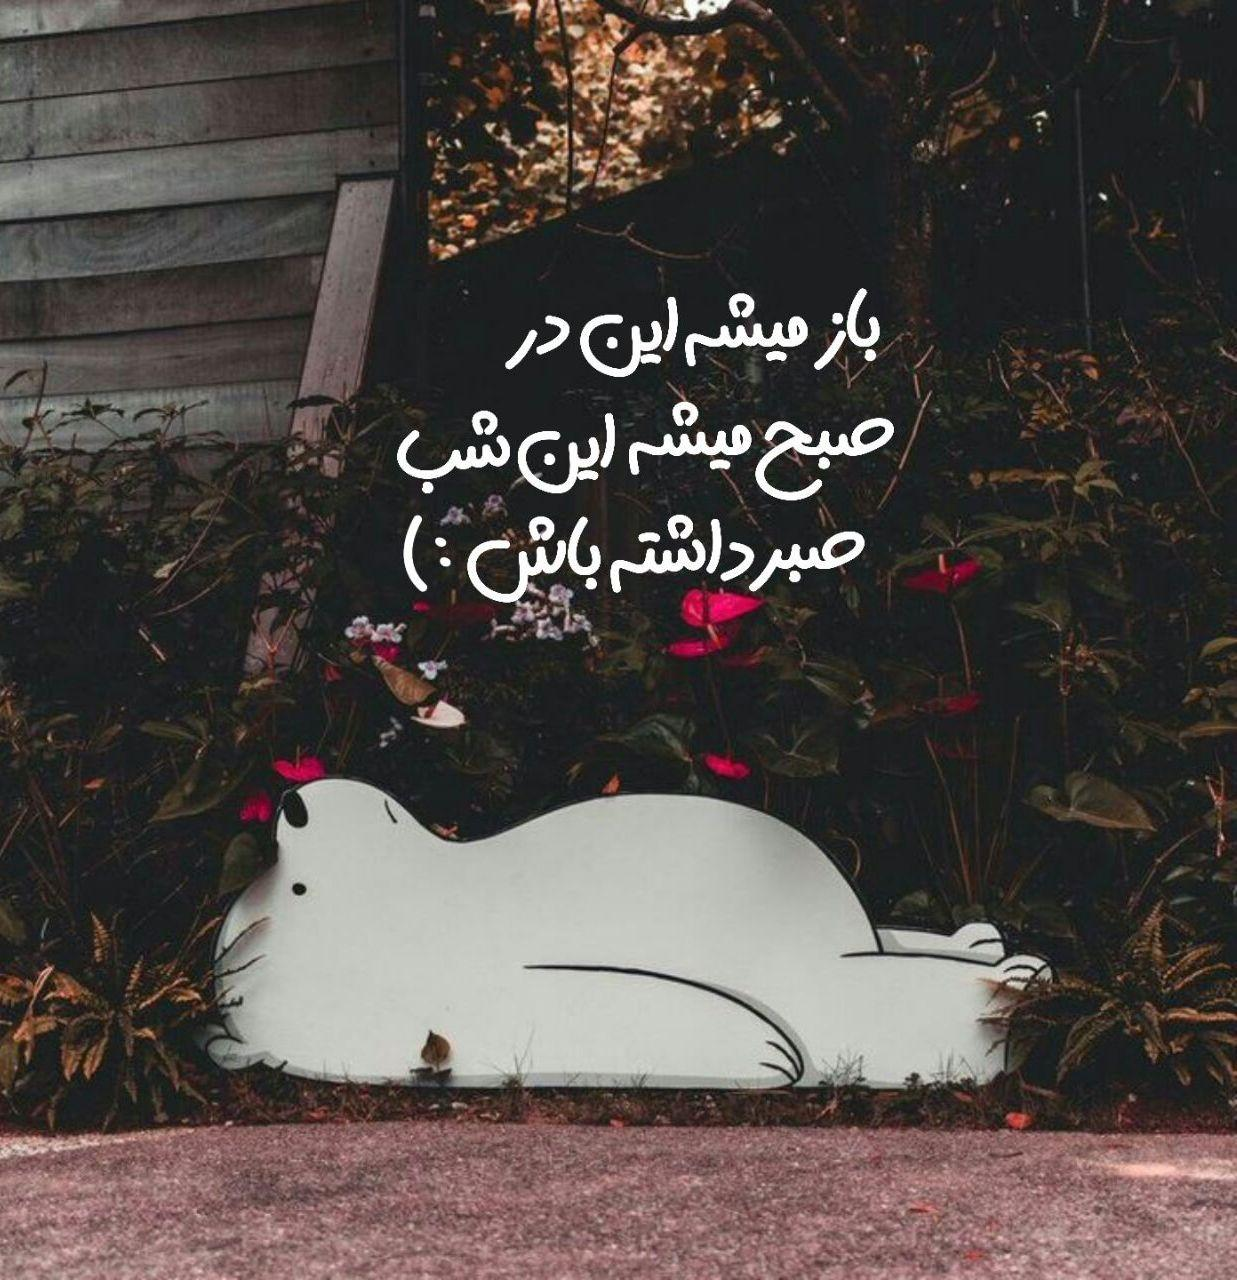 عکس پروفایل عاشقانه غمگین 2021 + عکس نوشته غمگین